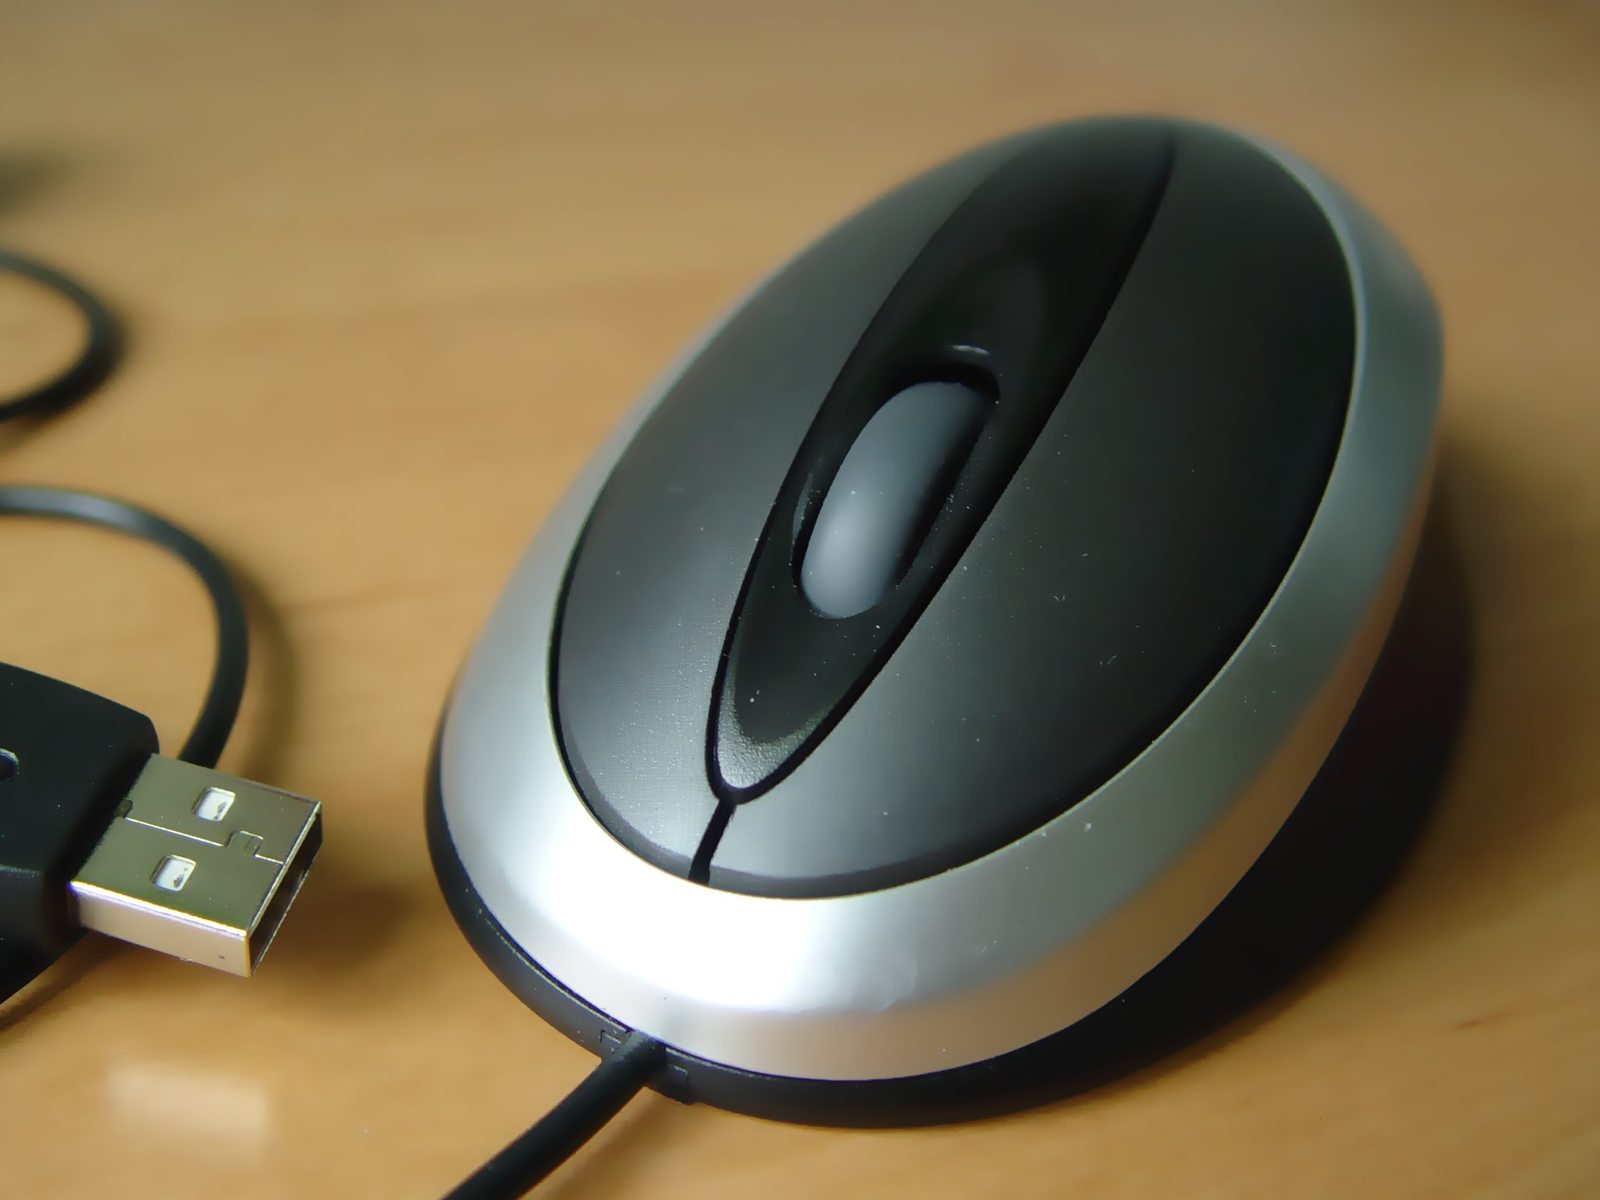 Mouse & USB